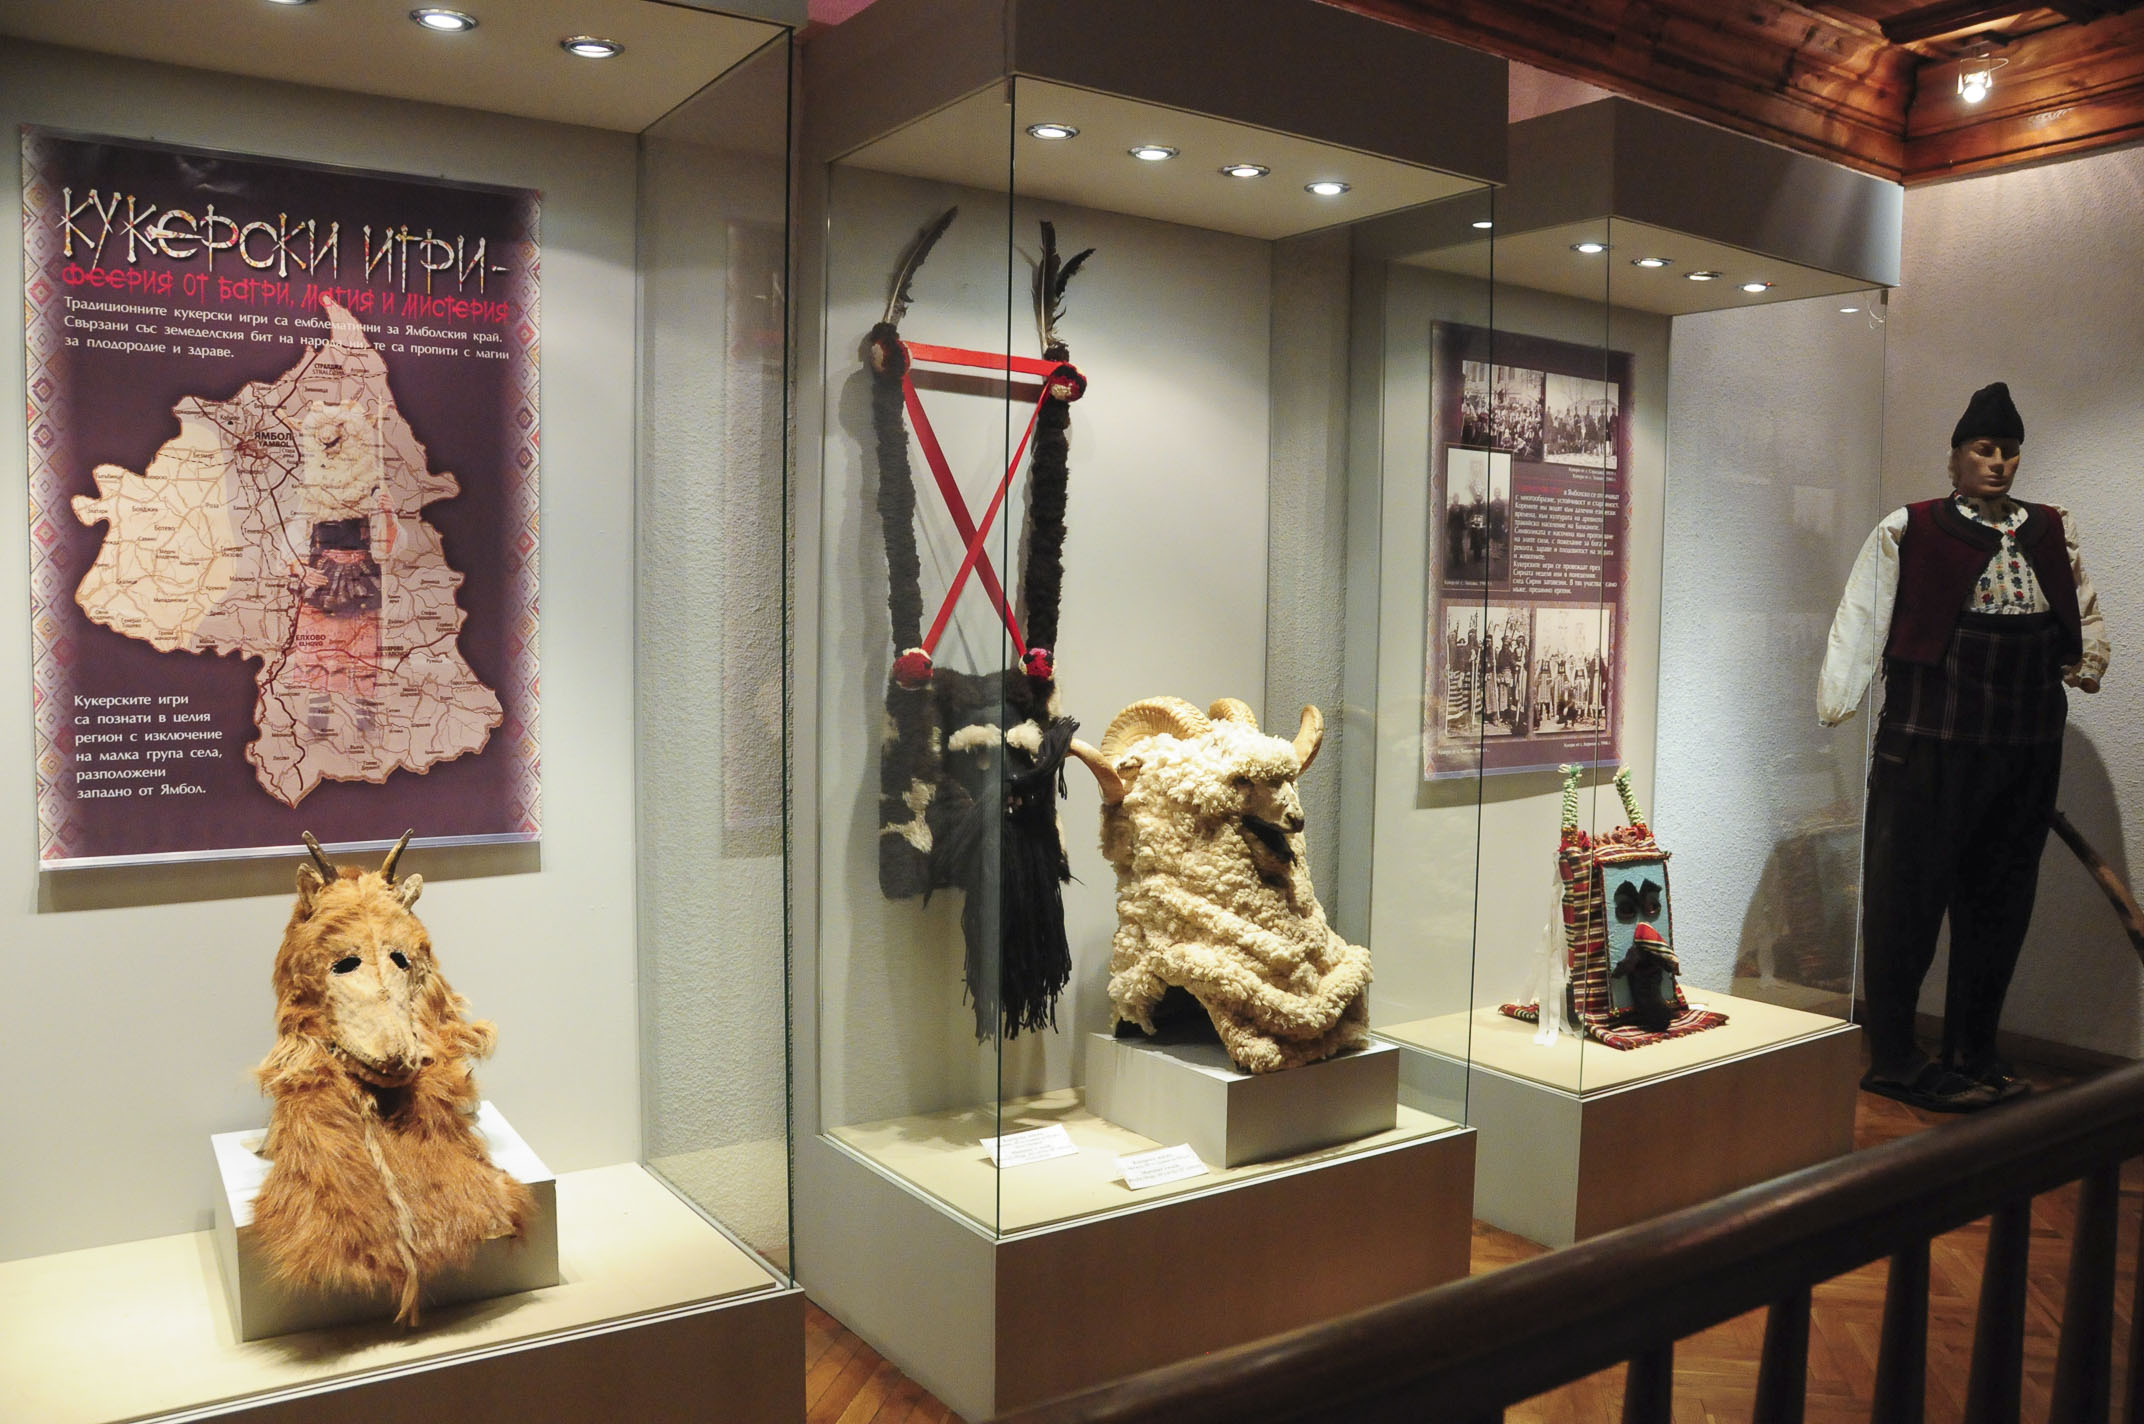 troyan-museum-kukerski-igri-2